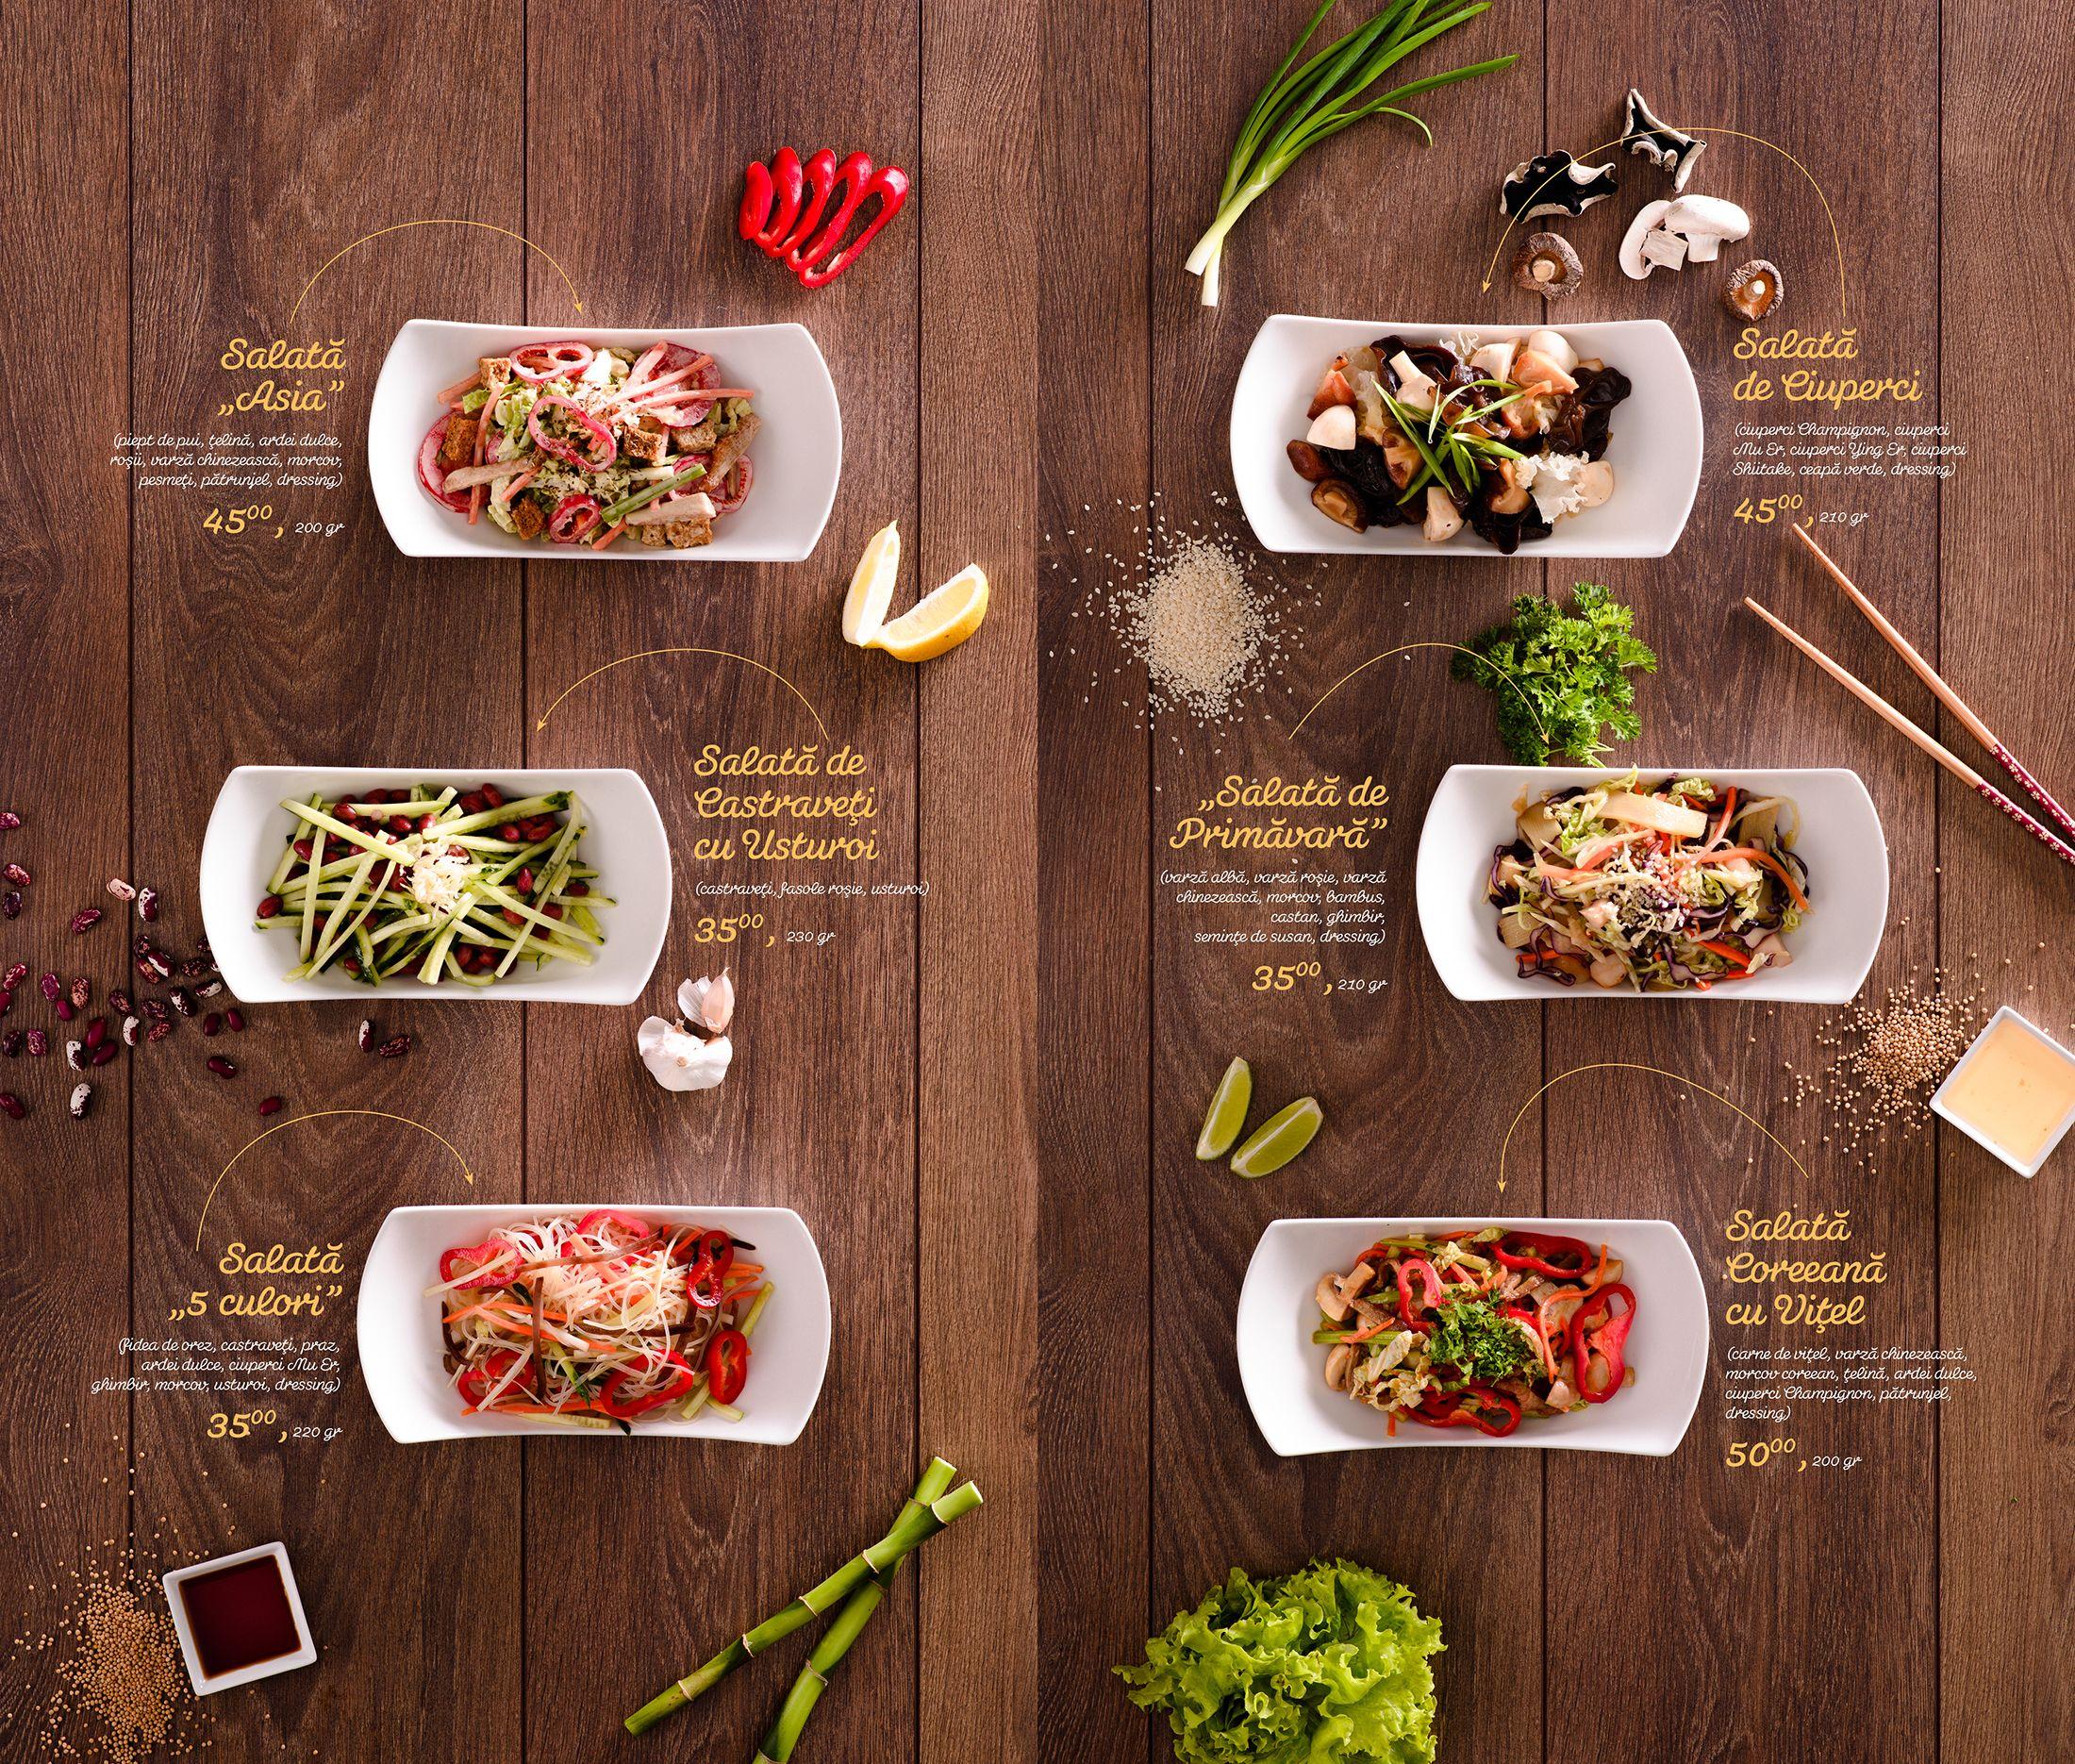 Key Visual Food Styling And Menu Design For Asian House Food Menu Design Restaurant Menu Design Menu Restaurant